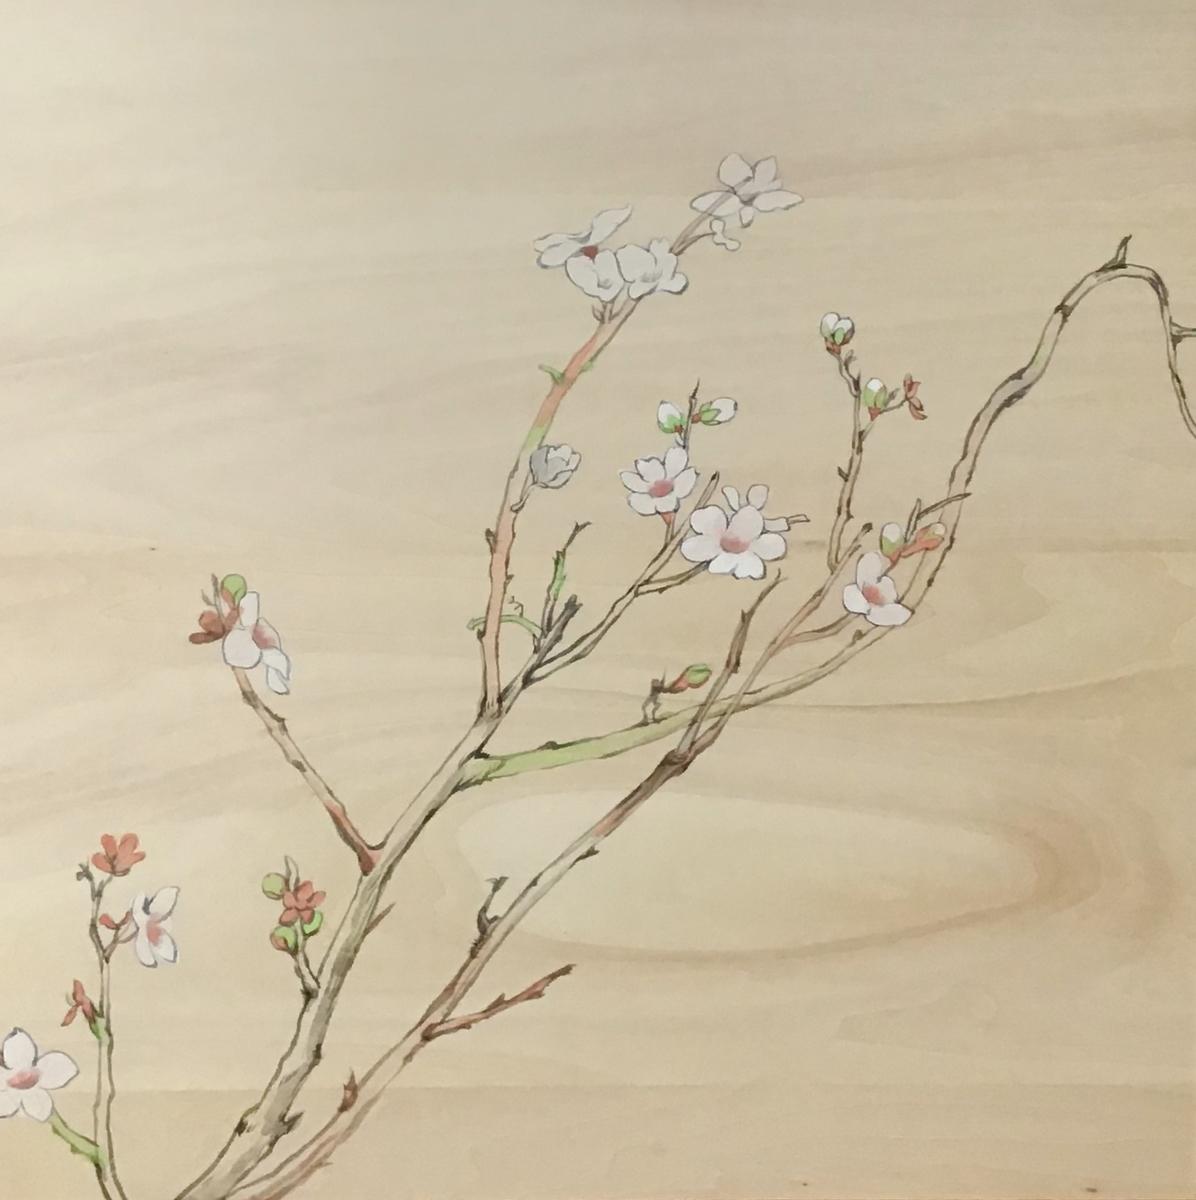 f:id:daikouji:20210613132528j:plain